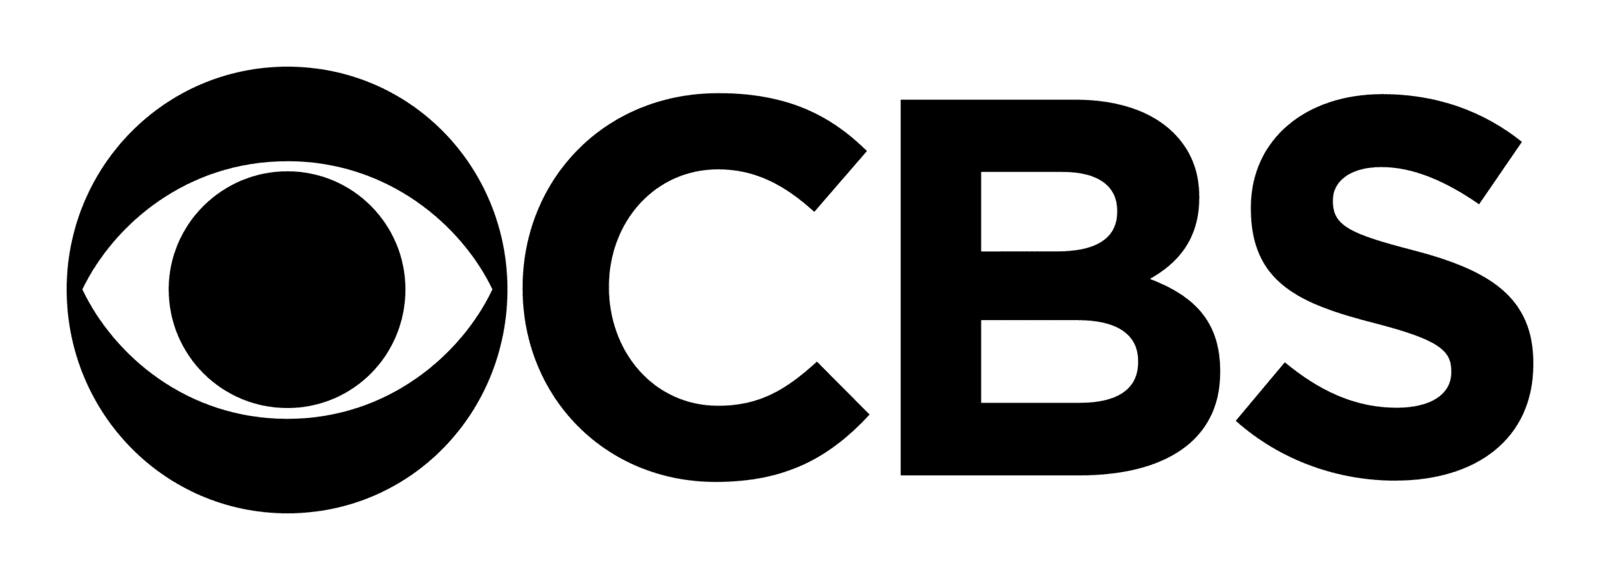 CBS TRANSPARENT